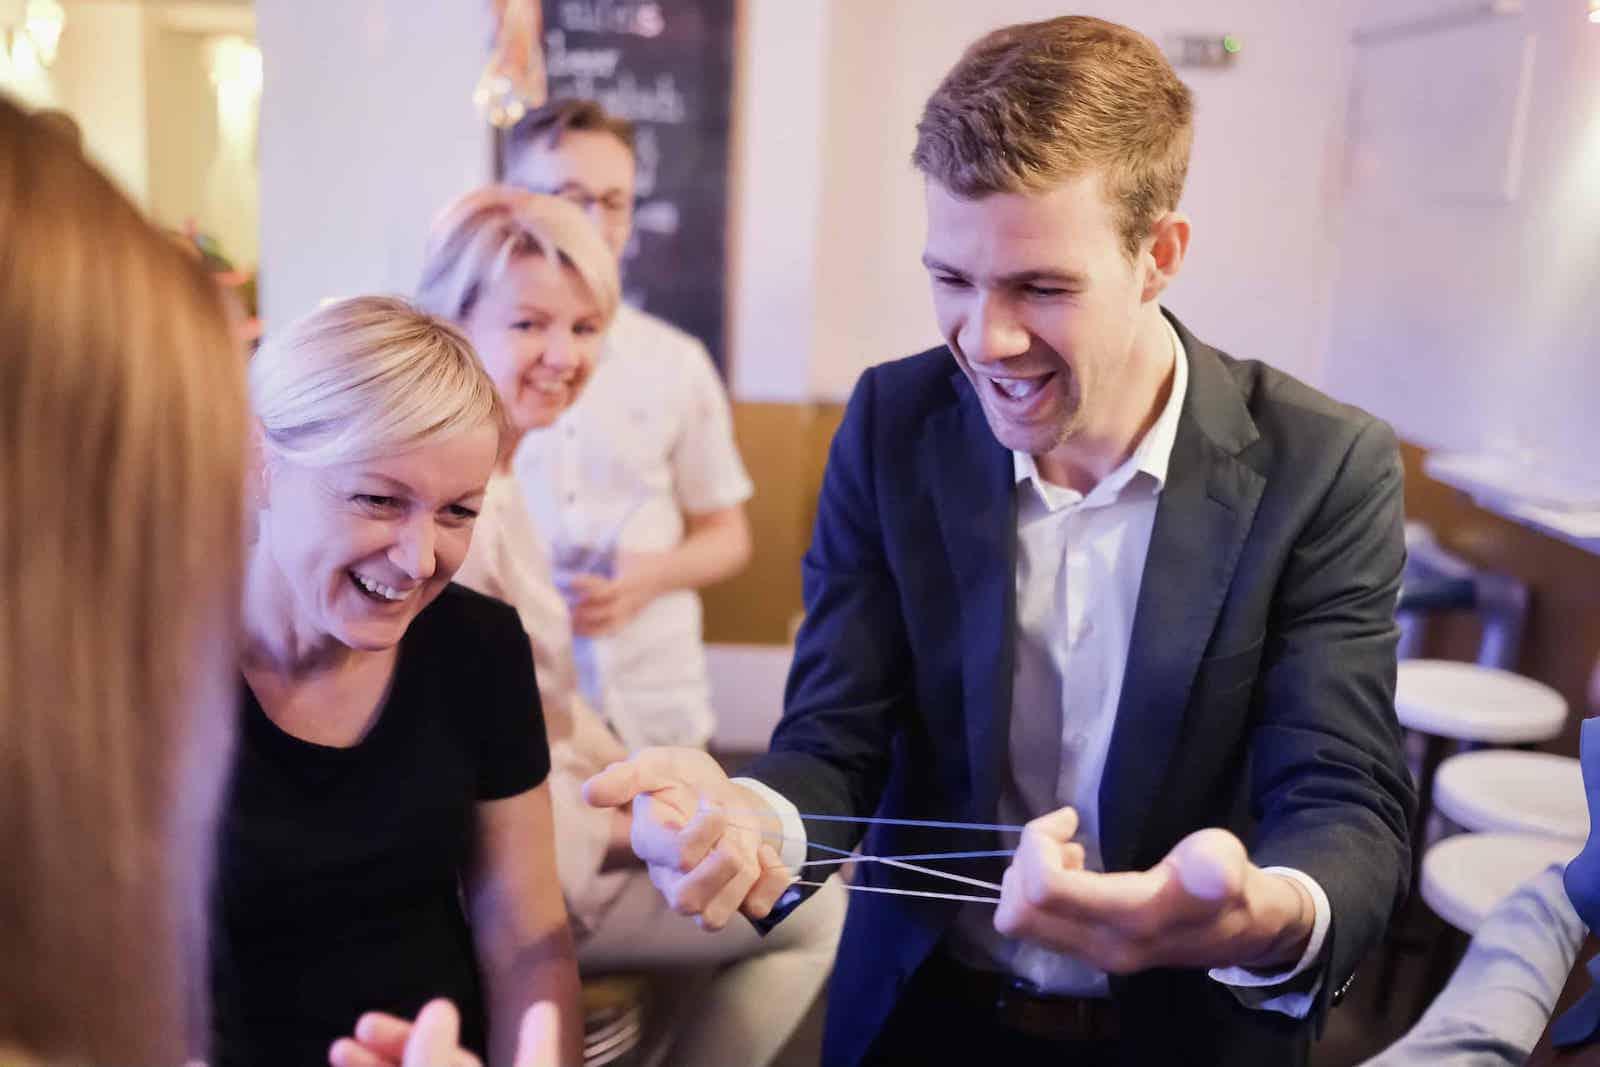 Zauberer Leverkusen mit Publikum beim zaubern